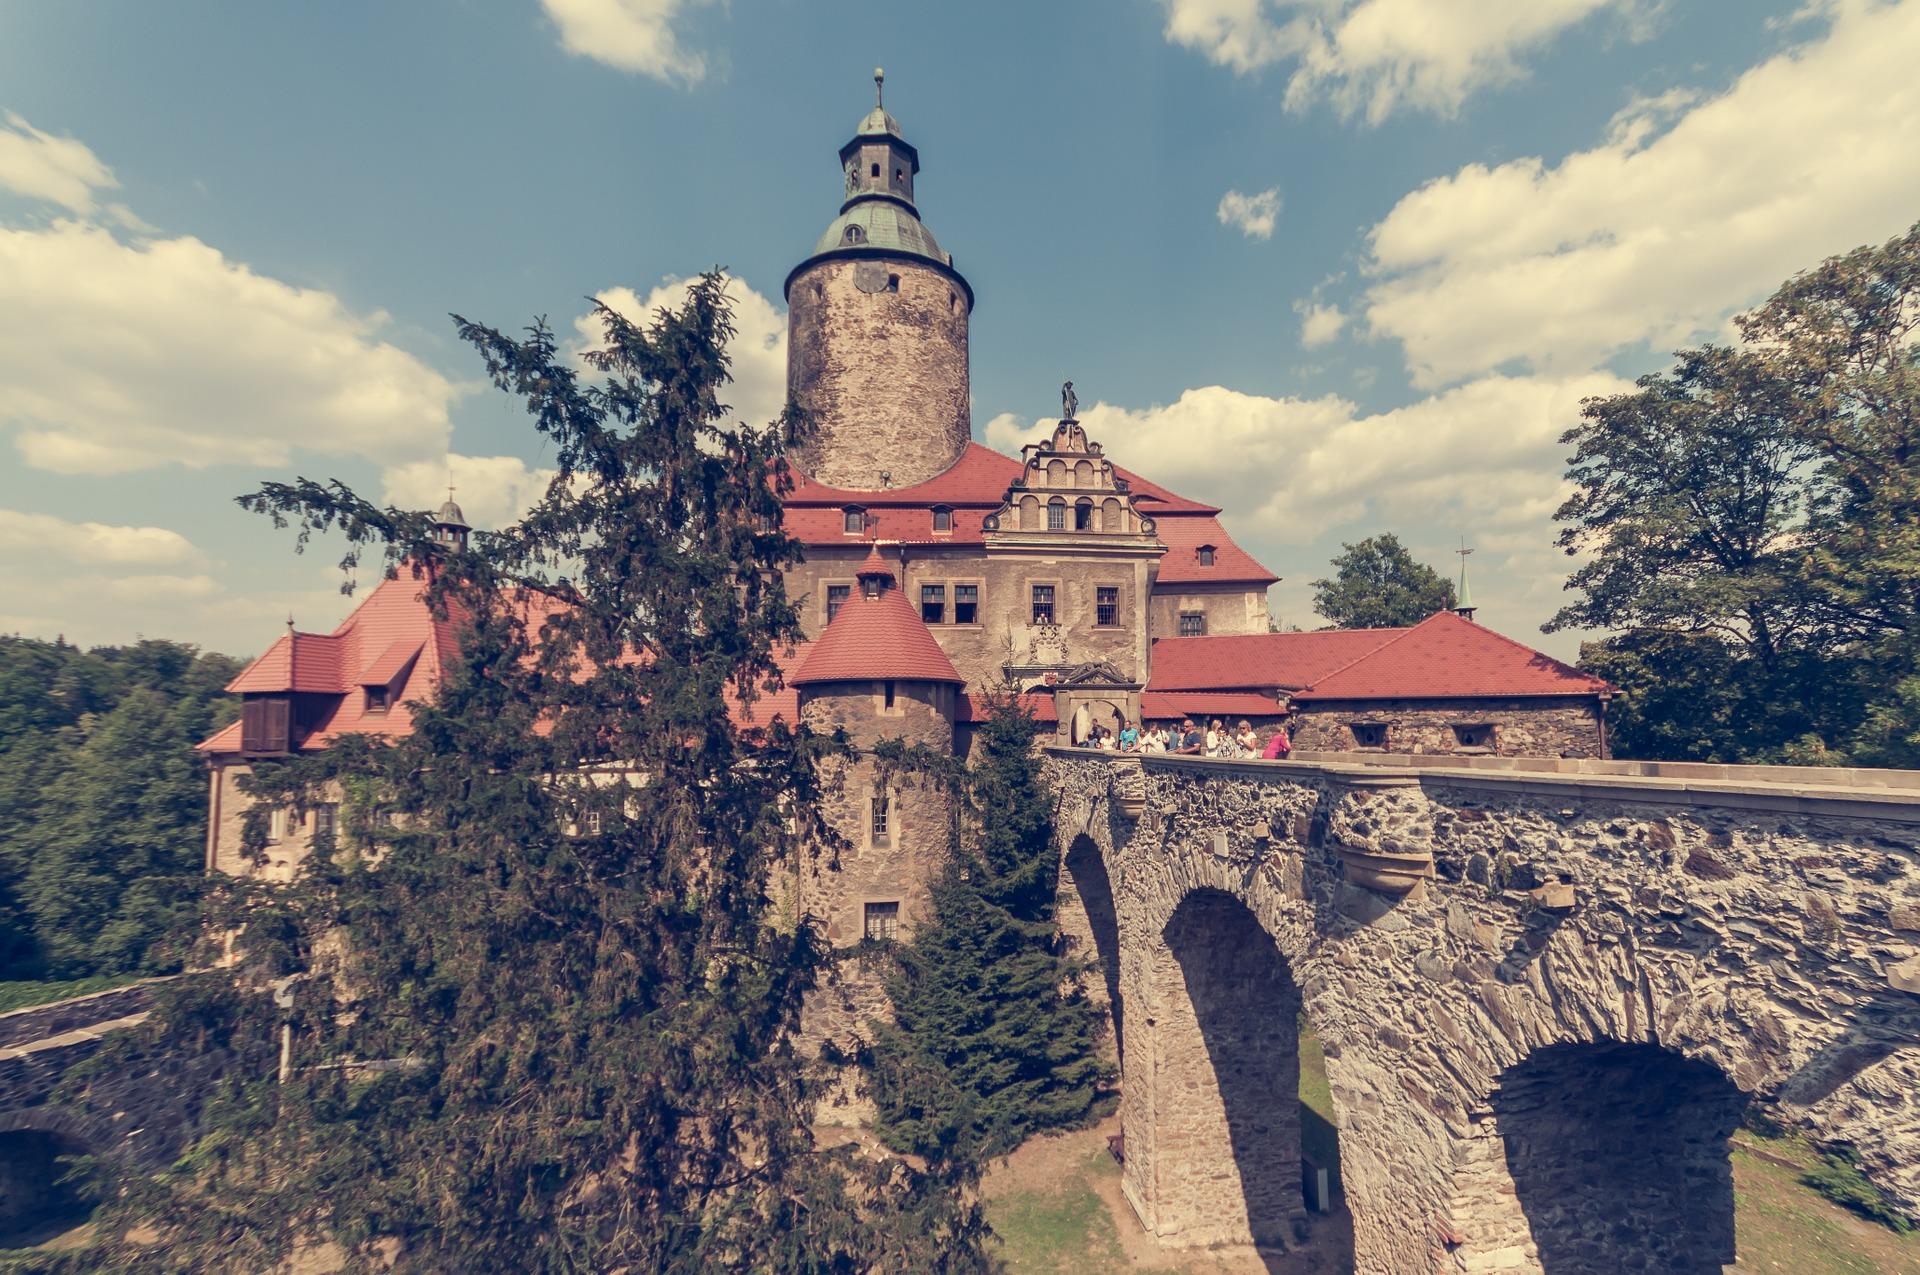 Old castle photo